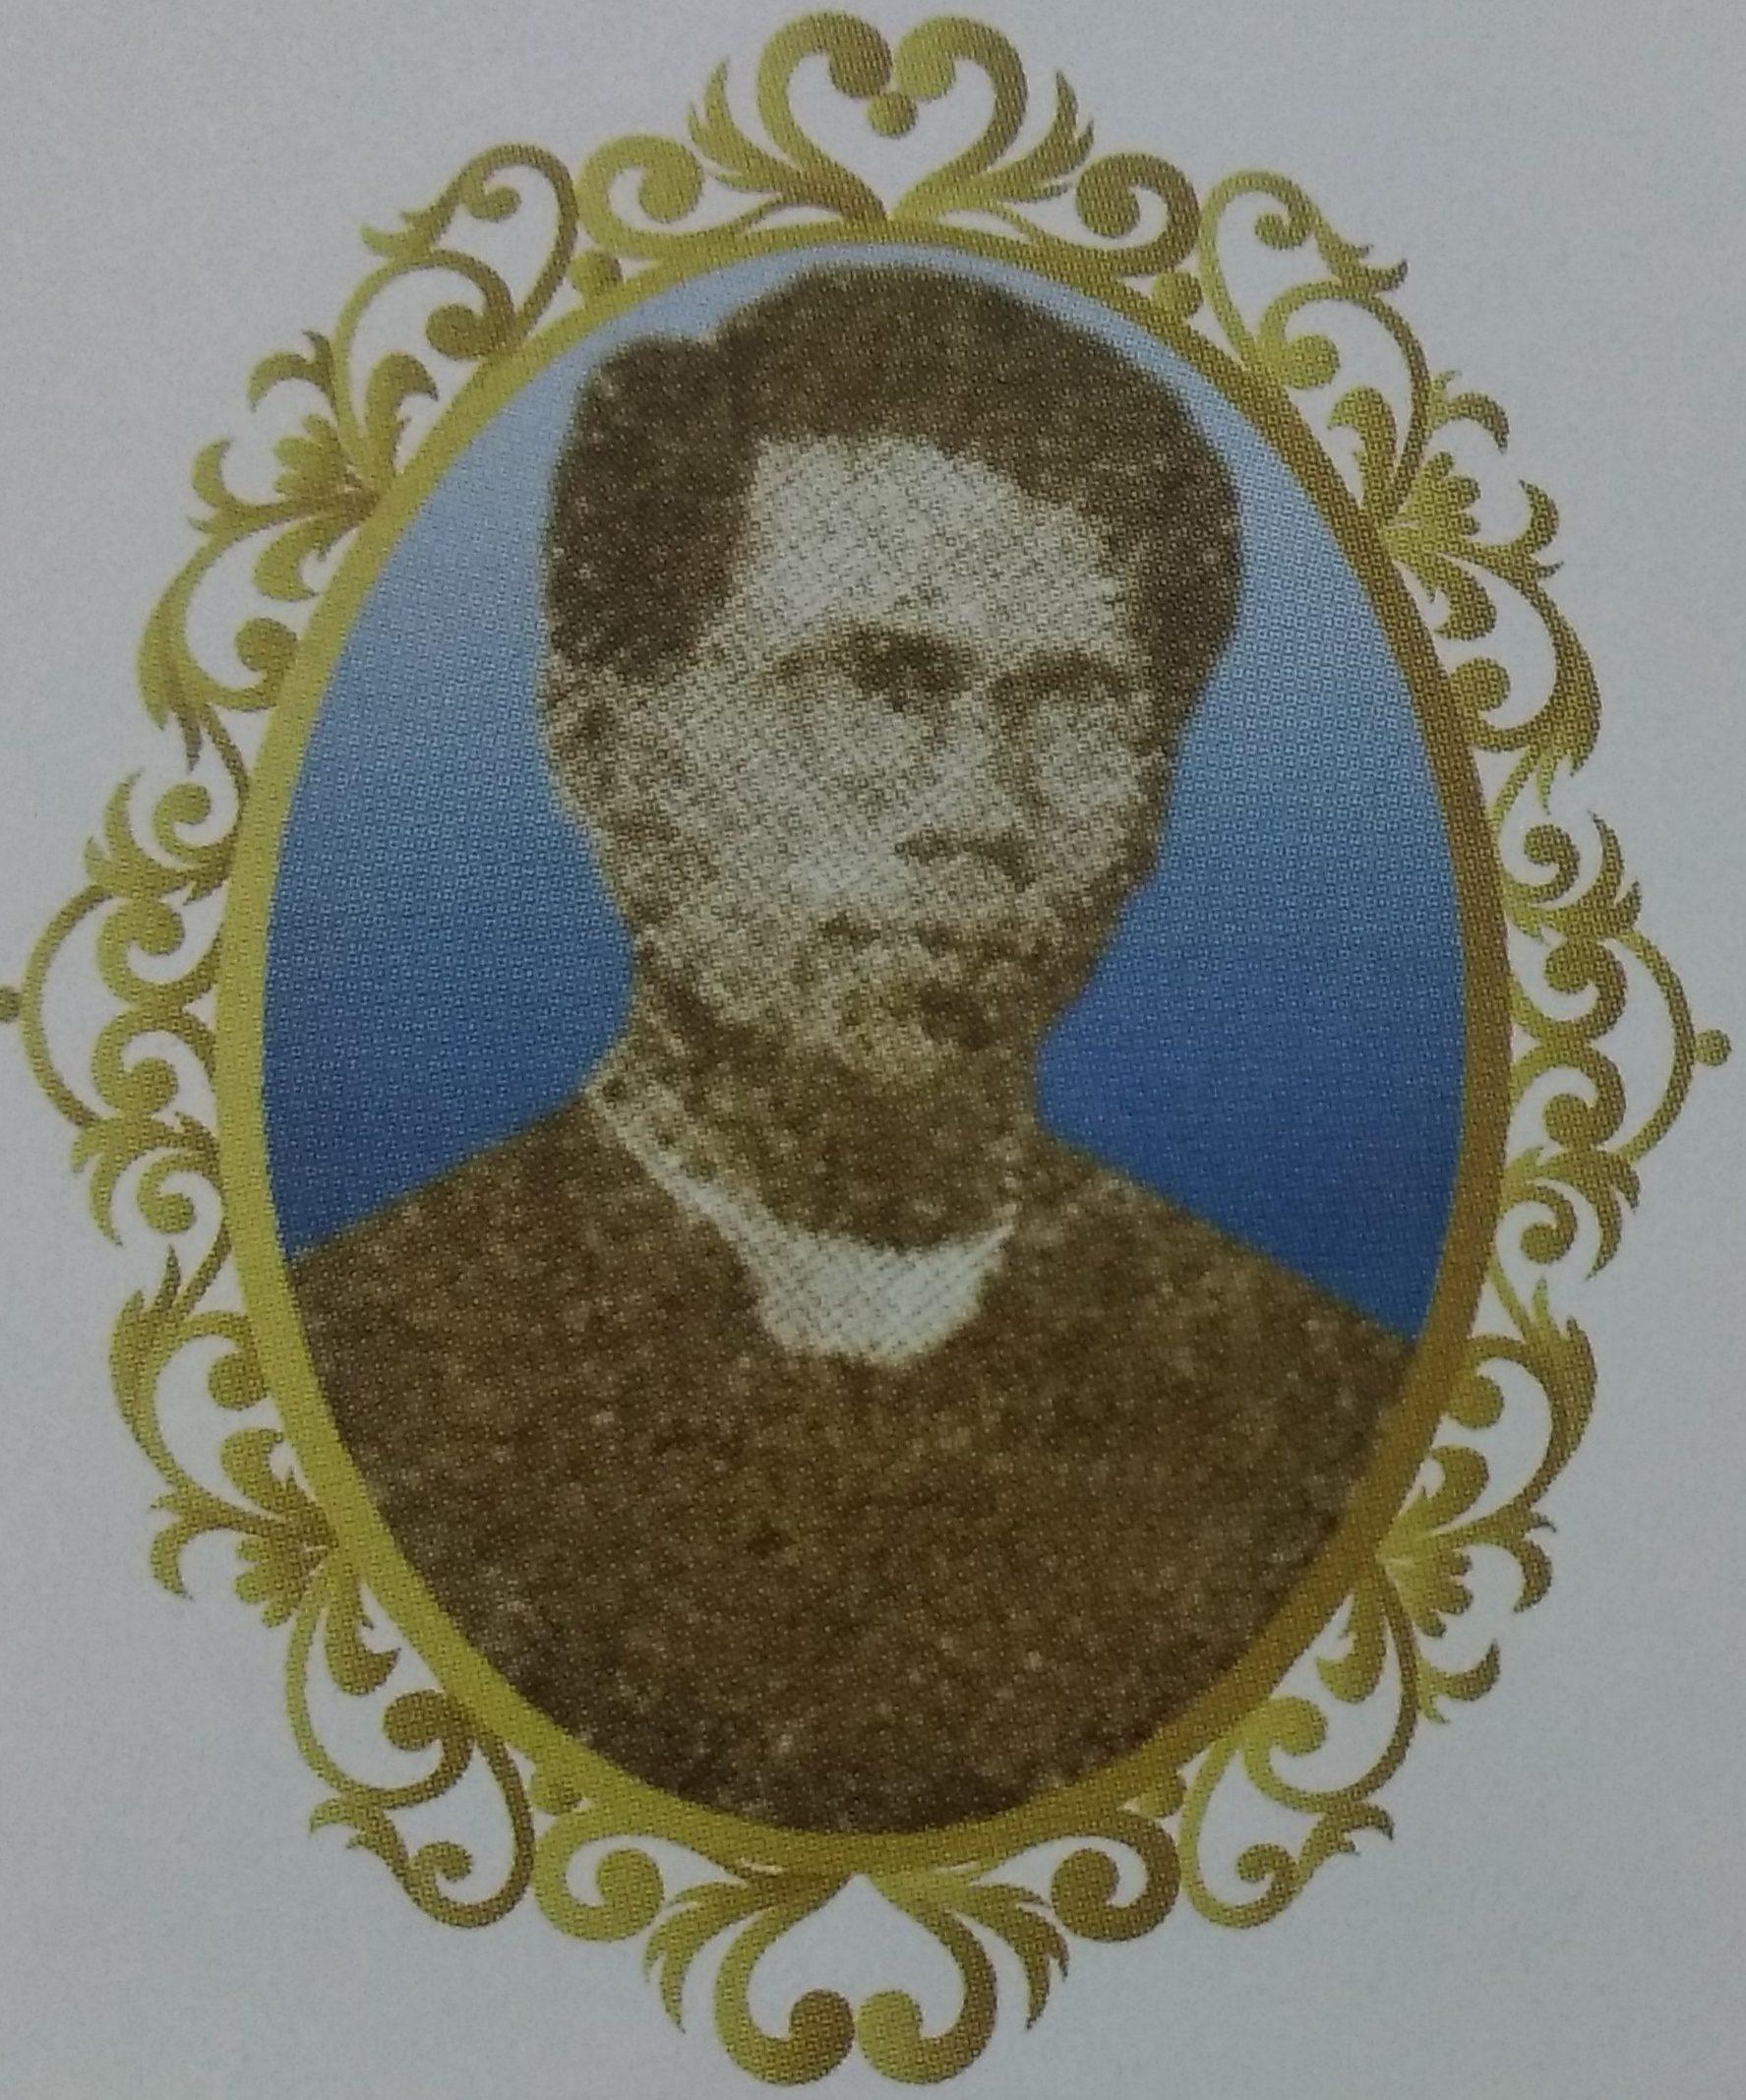 Fr. Joseph Padamatttummel